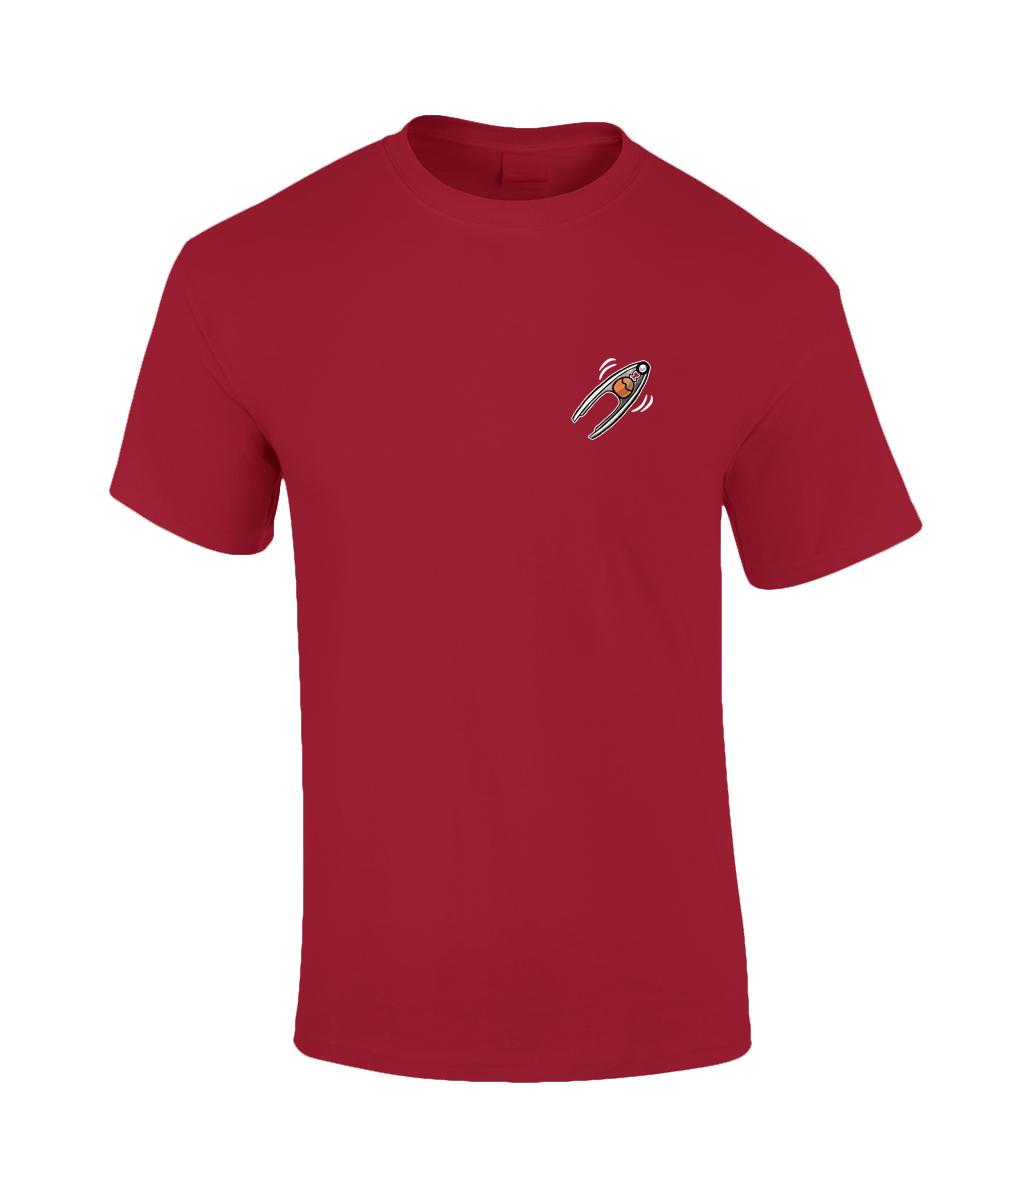 NutCracker-Unisex_T-Shirt_CherryRed